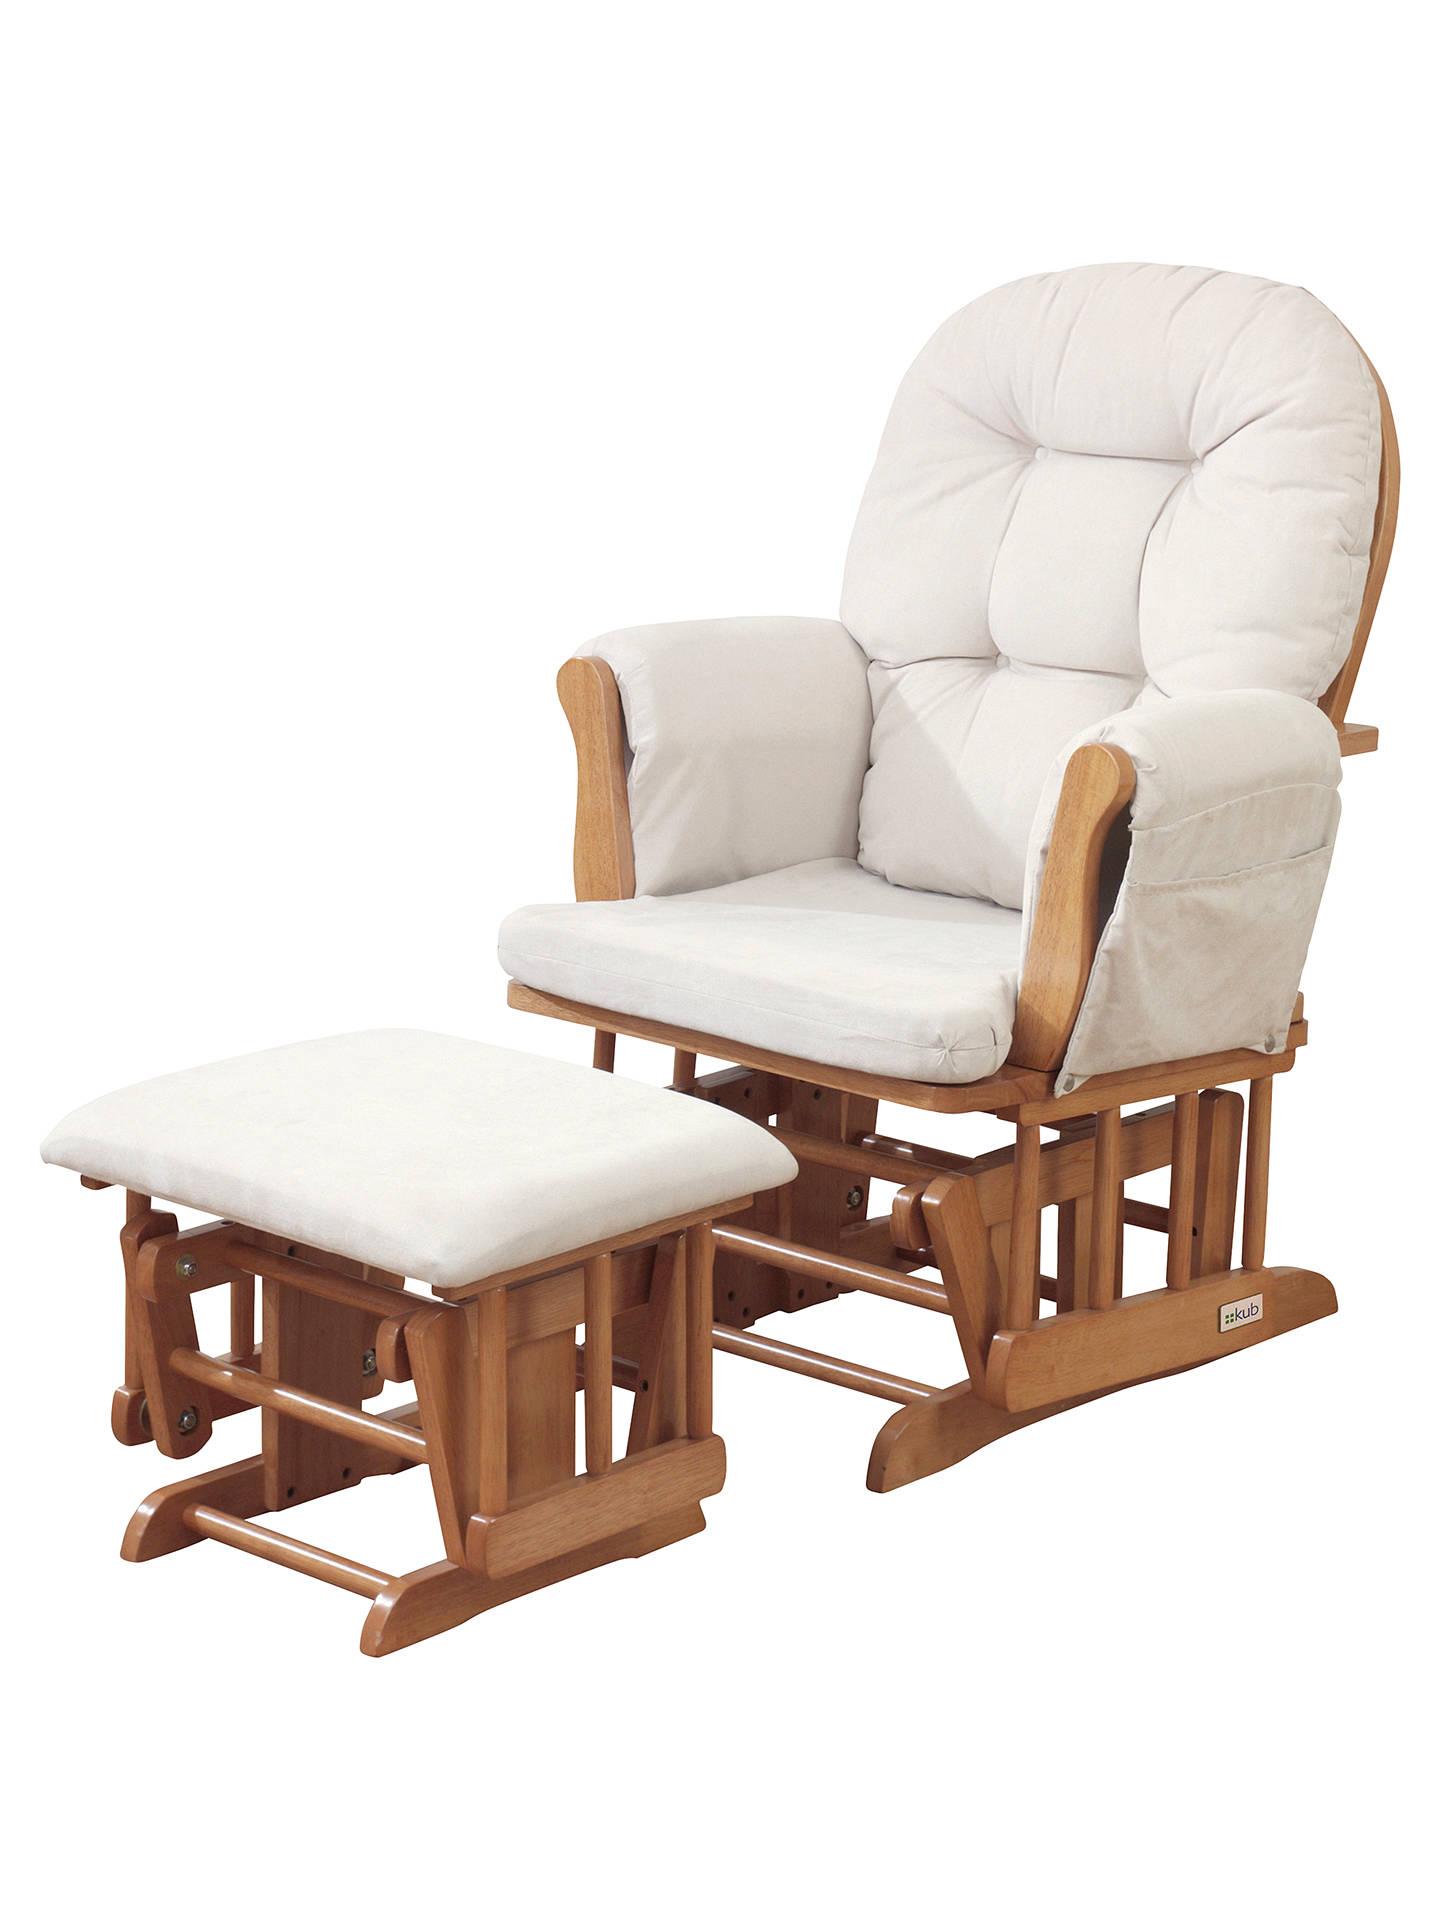 Swell Kub Haywood Glider Nursing Chair And Footstool Natural Evergreenethics Interior Chair Design Evergreenethicsorg